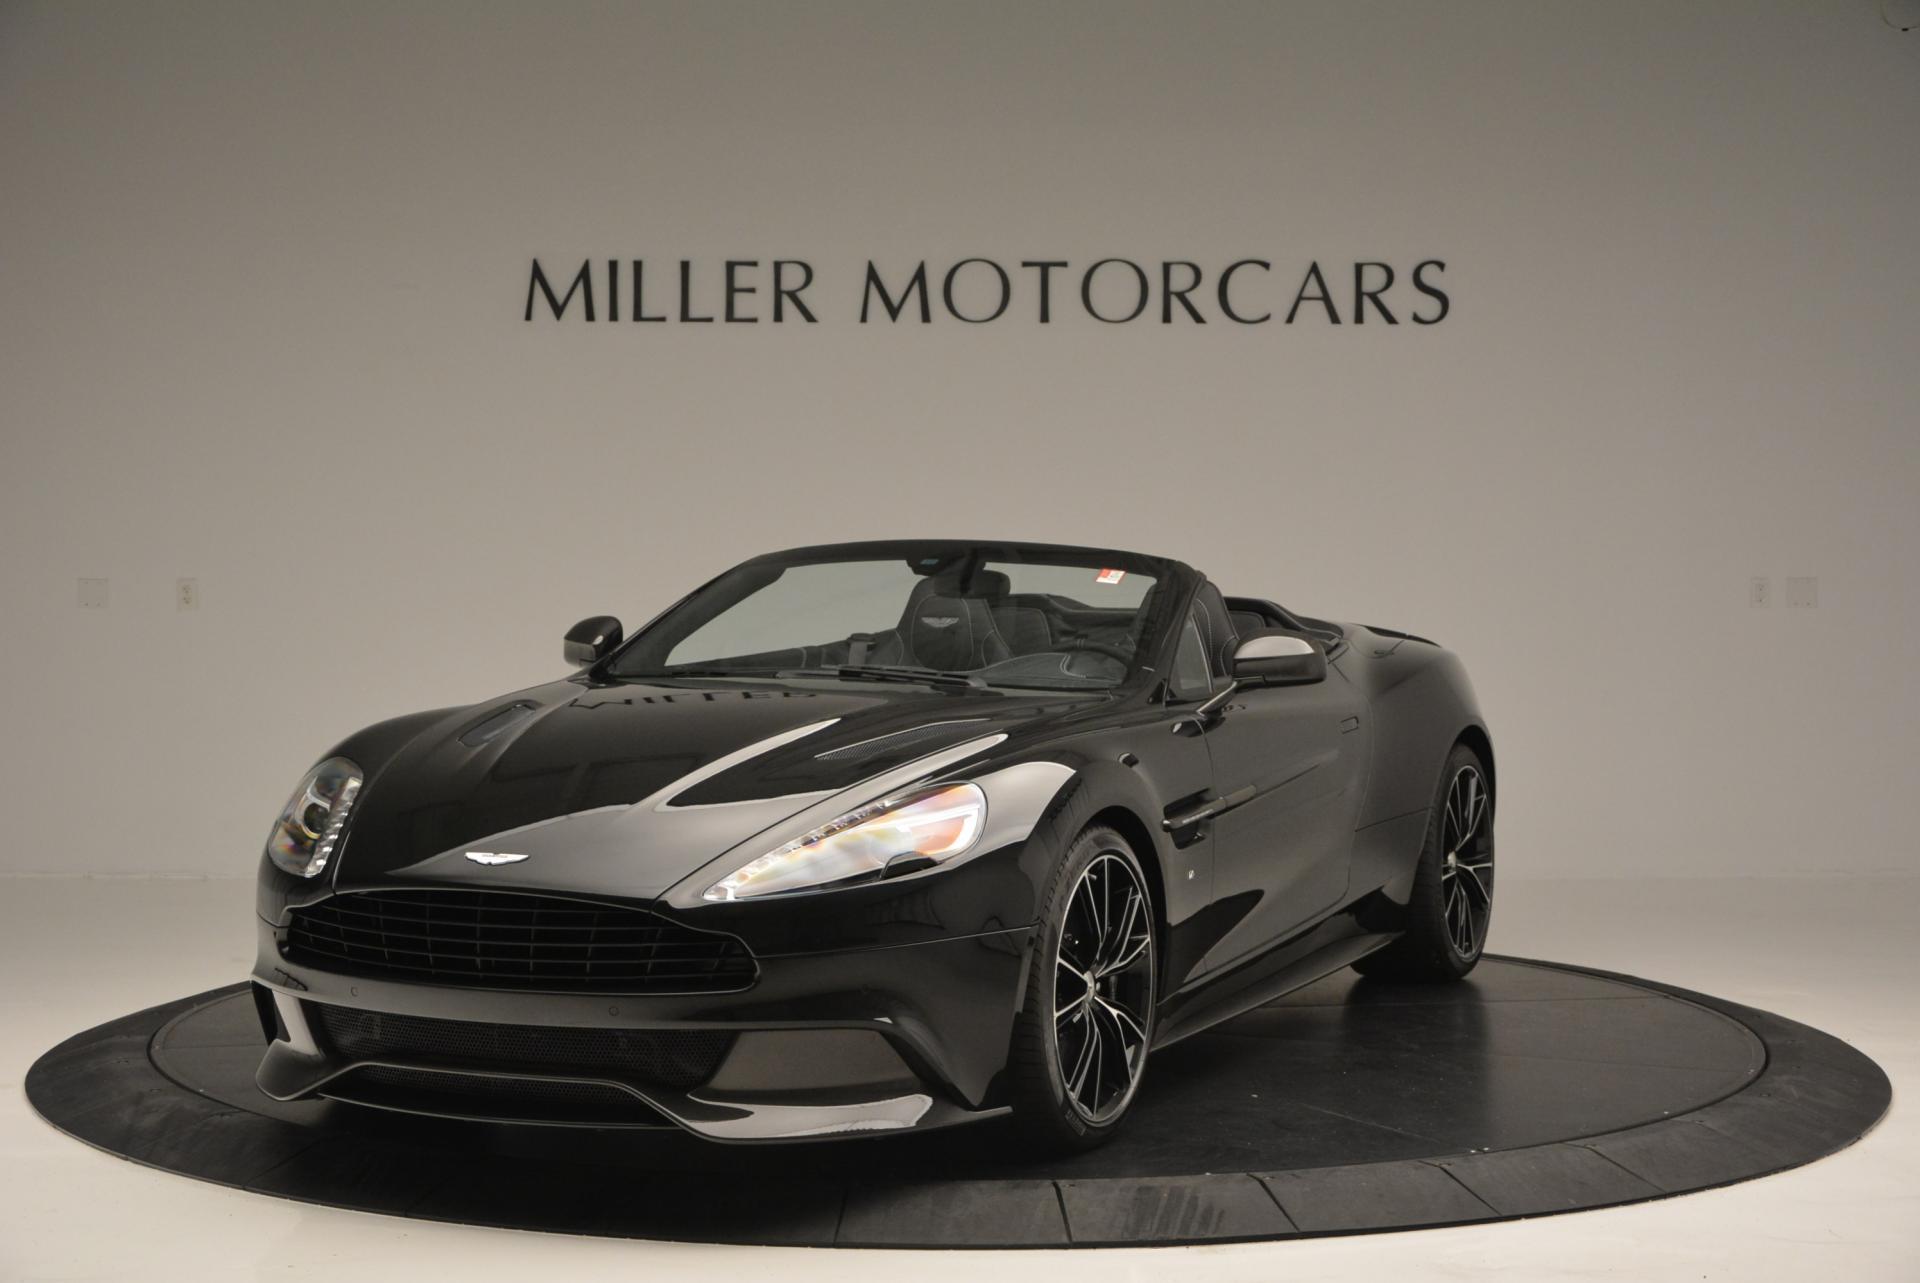 New 2016 Aston Martin Vanquish Volante for sale Sold at McLaren Greenwich in Greenwich CT 06830 1